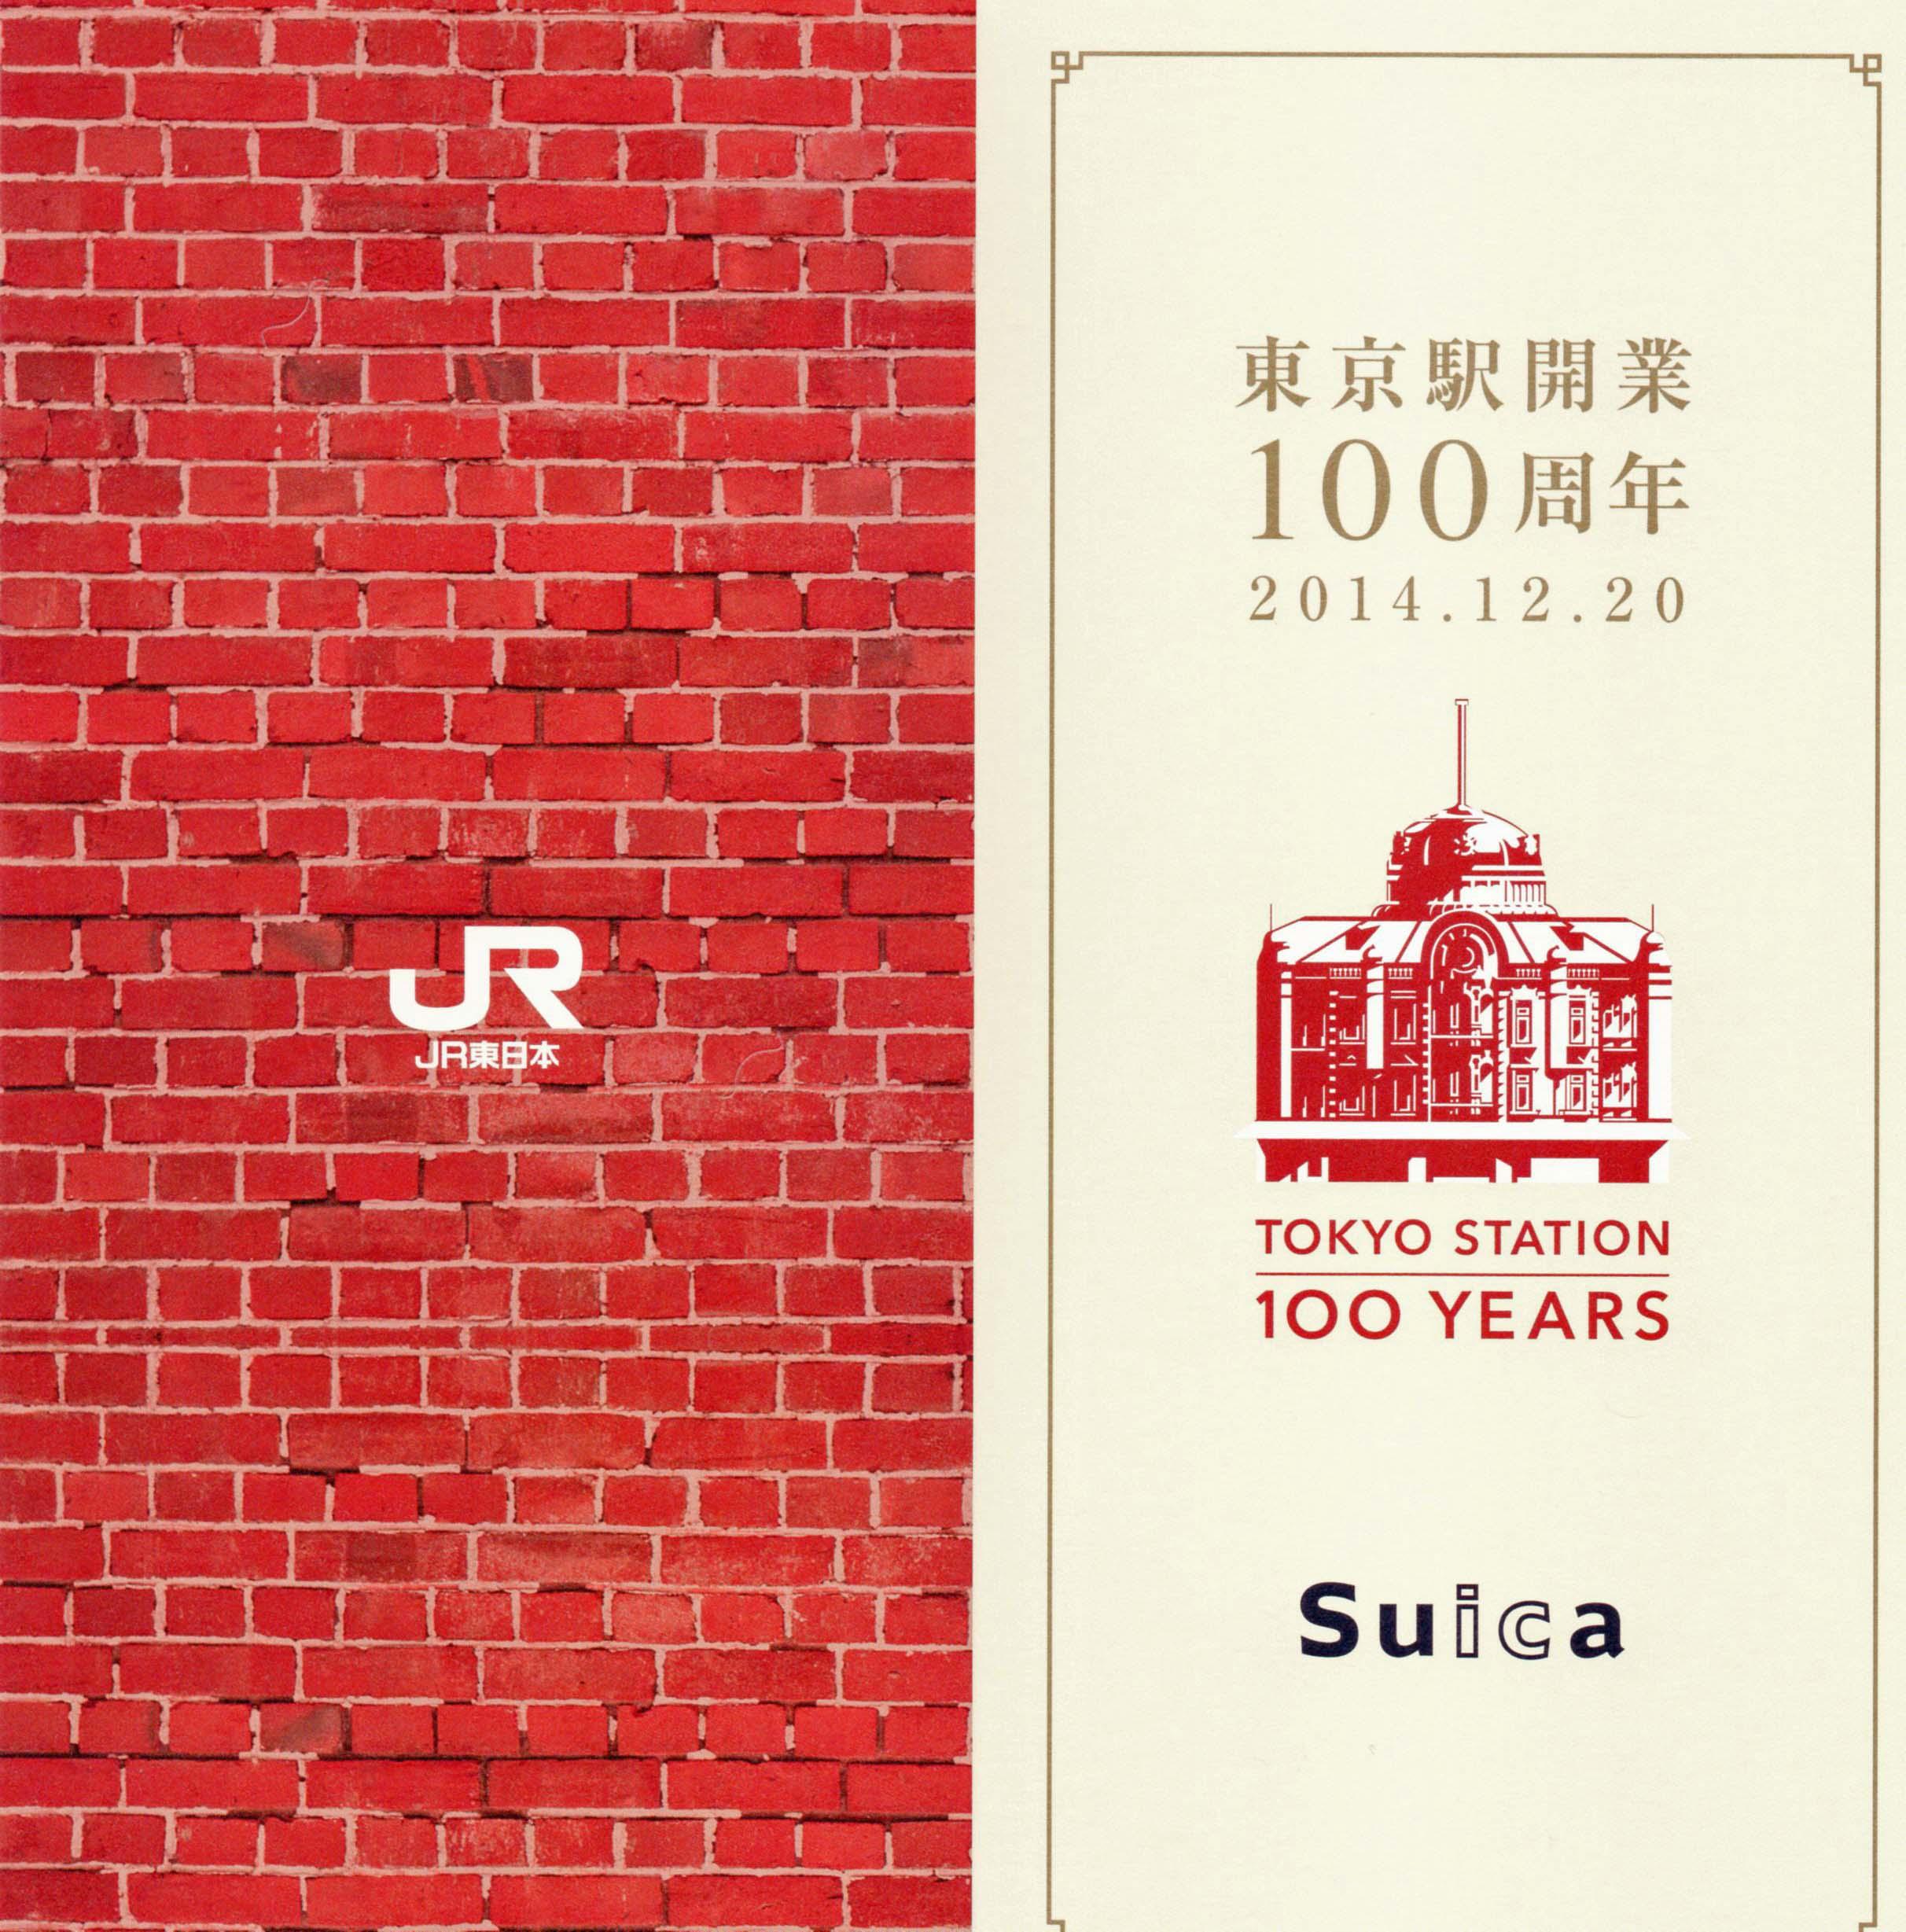 東京駅SUICA01